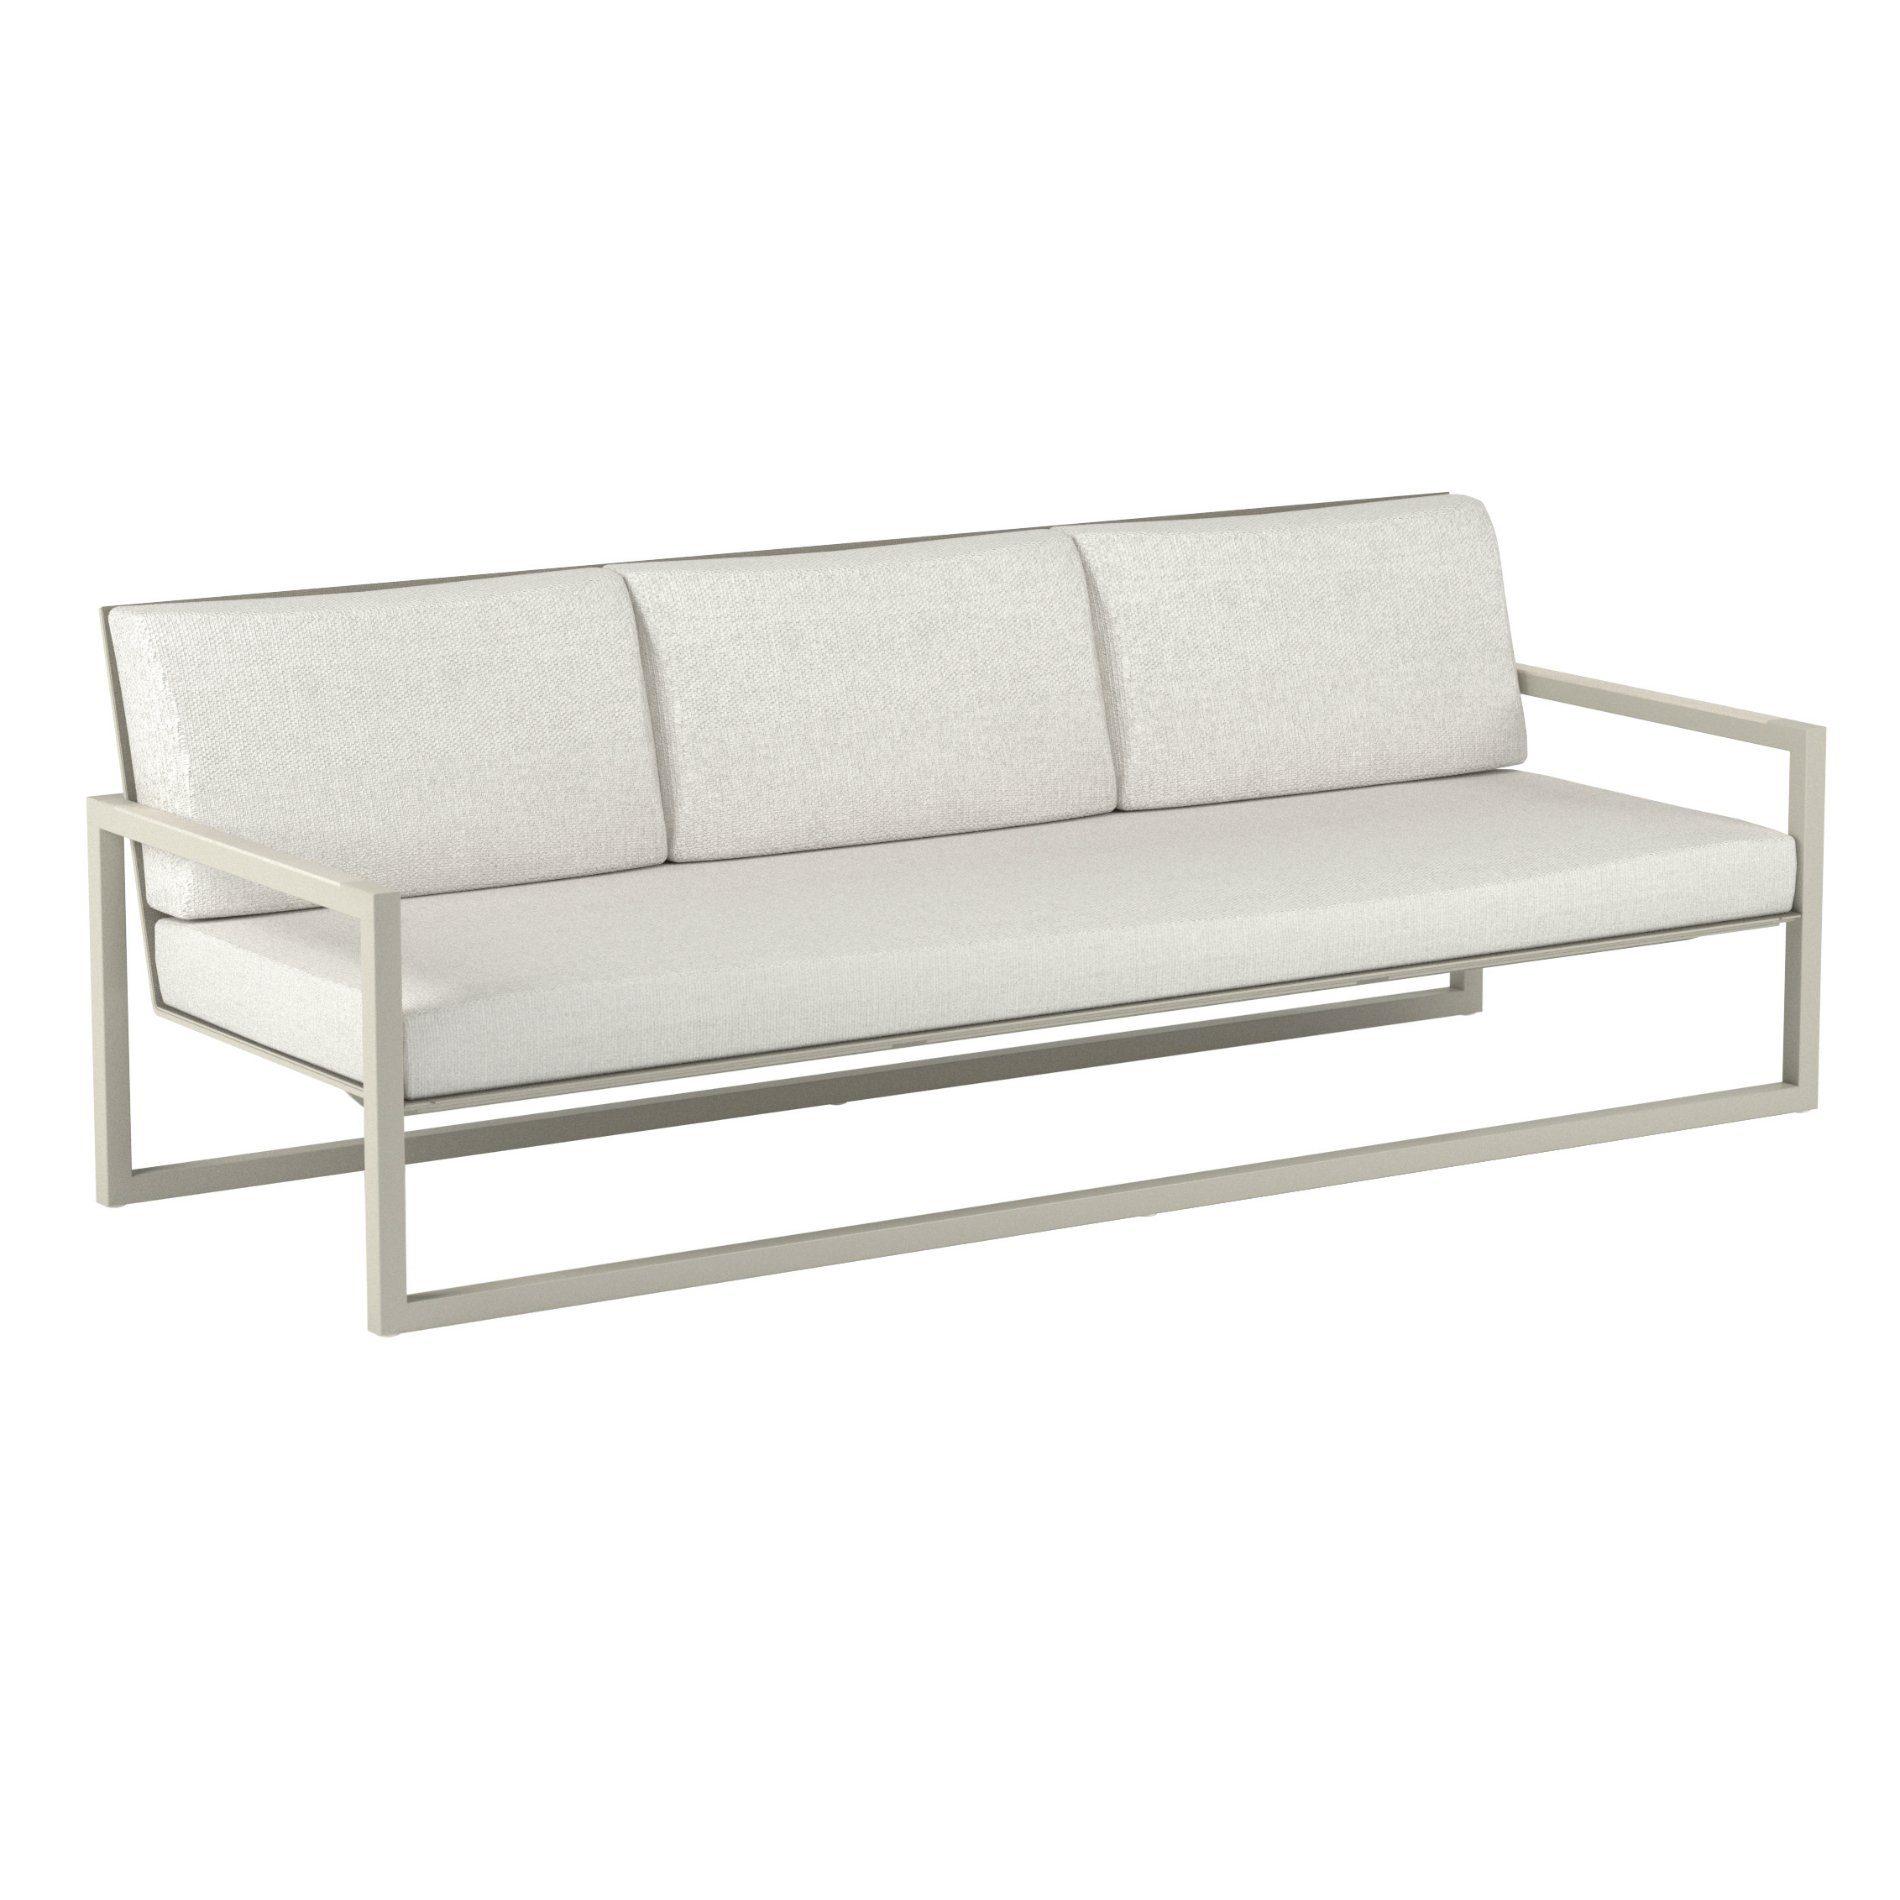 "Royal Botania ""Ninix 240"" 3-Sitzer Loungesofa, Gestell Aluminium sand, Bespannung Textilgewebe pearl grey, Kissen Ecru"